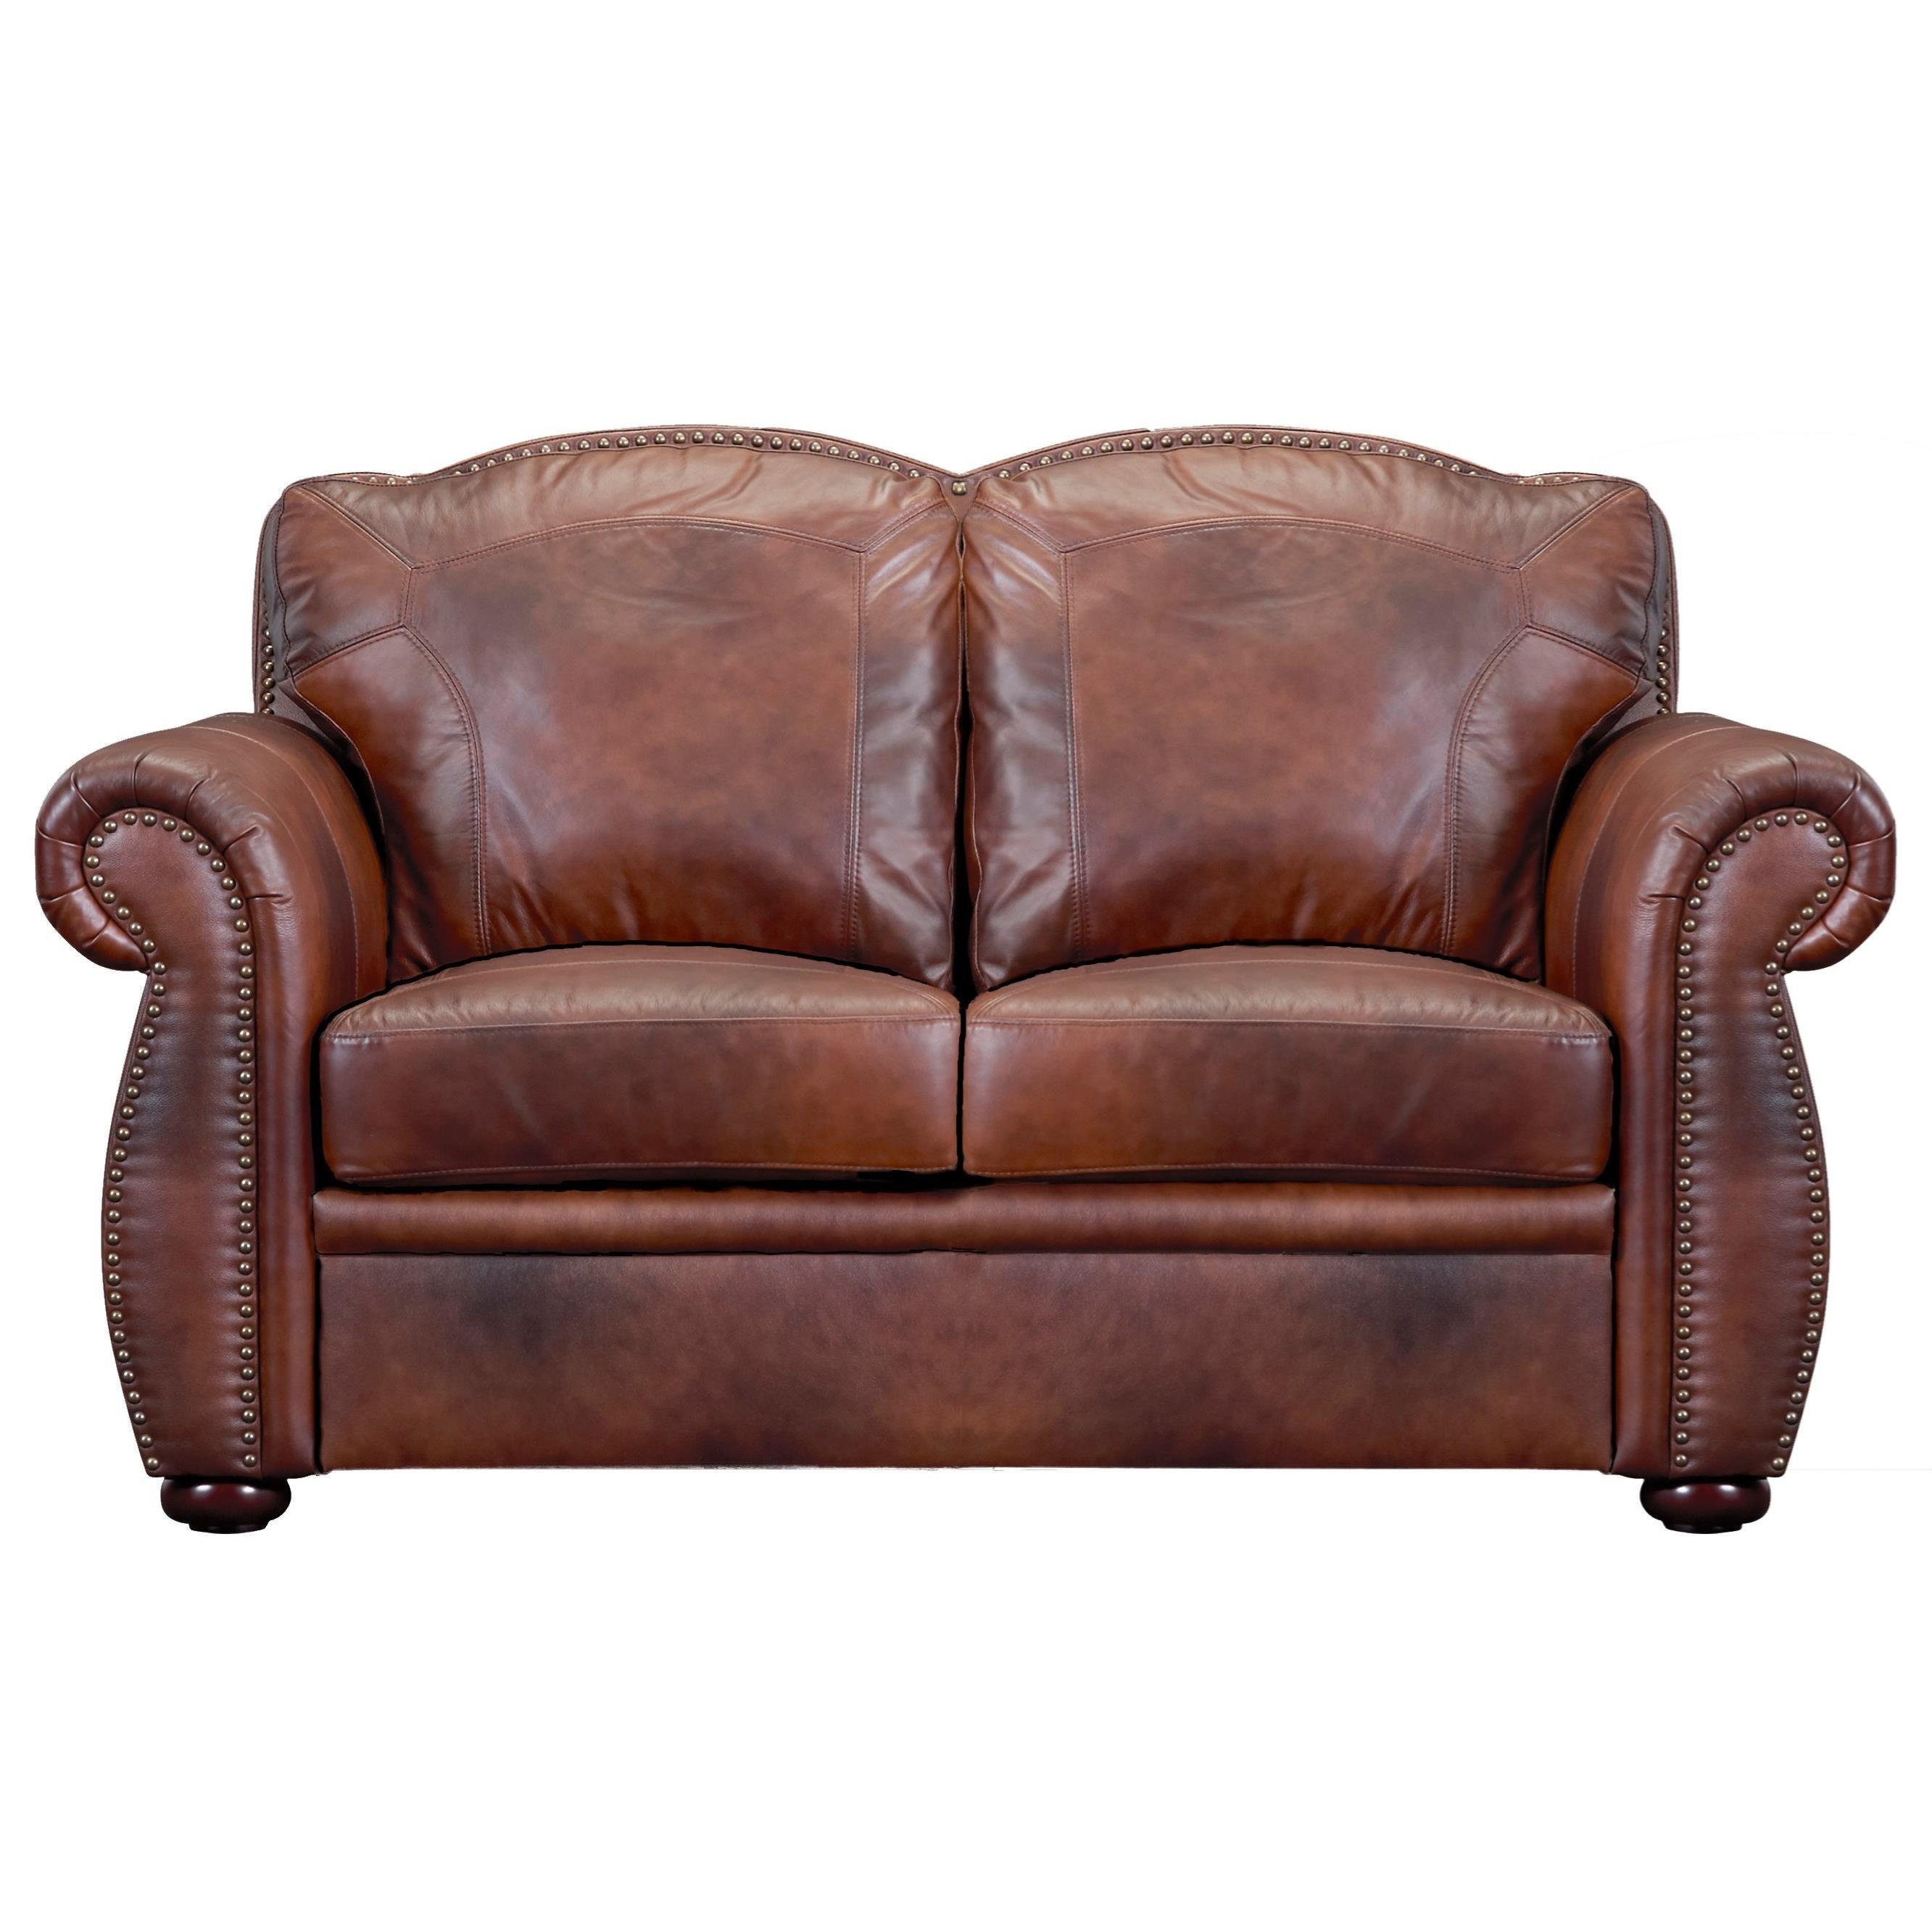 Arizona Leather Loveseat by Leather Italia USA at Lindy's Furniture Company